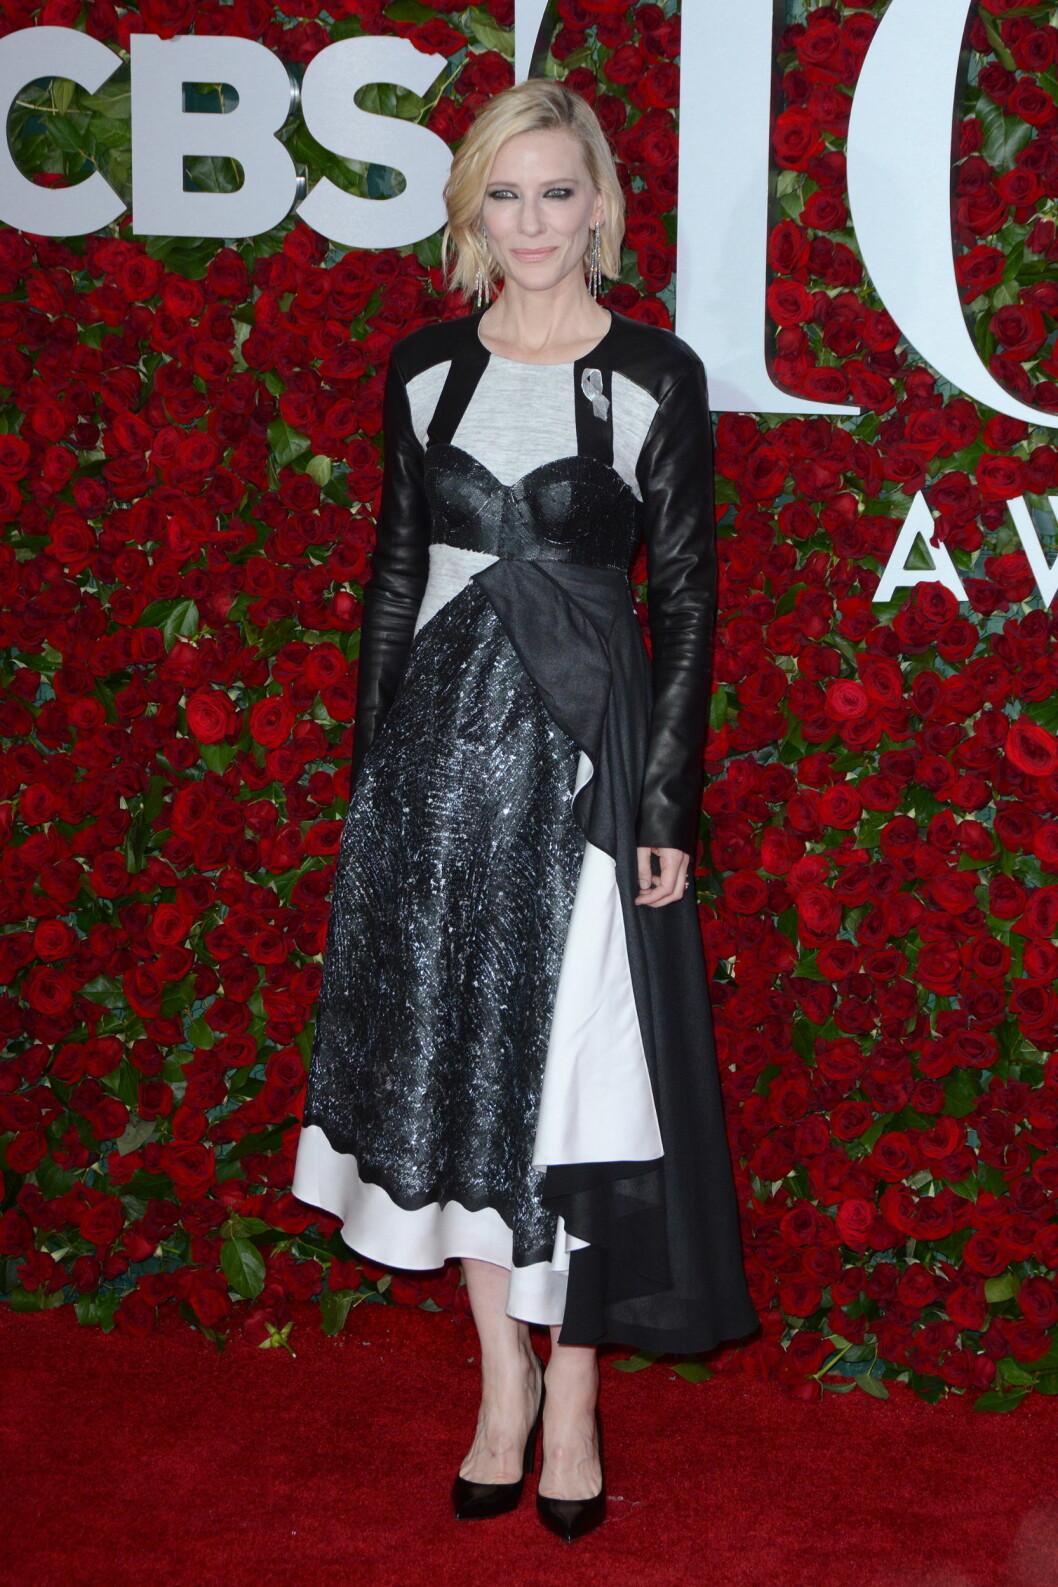 TONY AWARDS 2016: Cate Blanchett. Foto: wenn.com